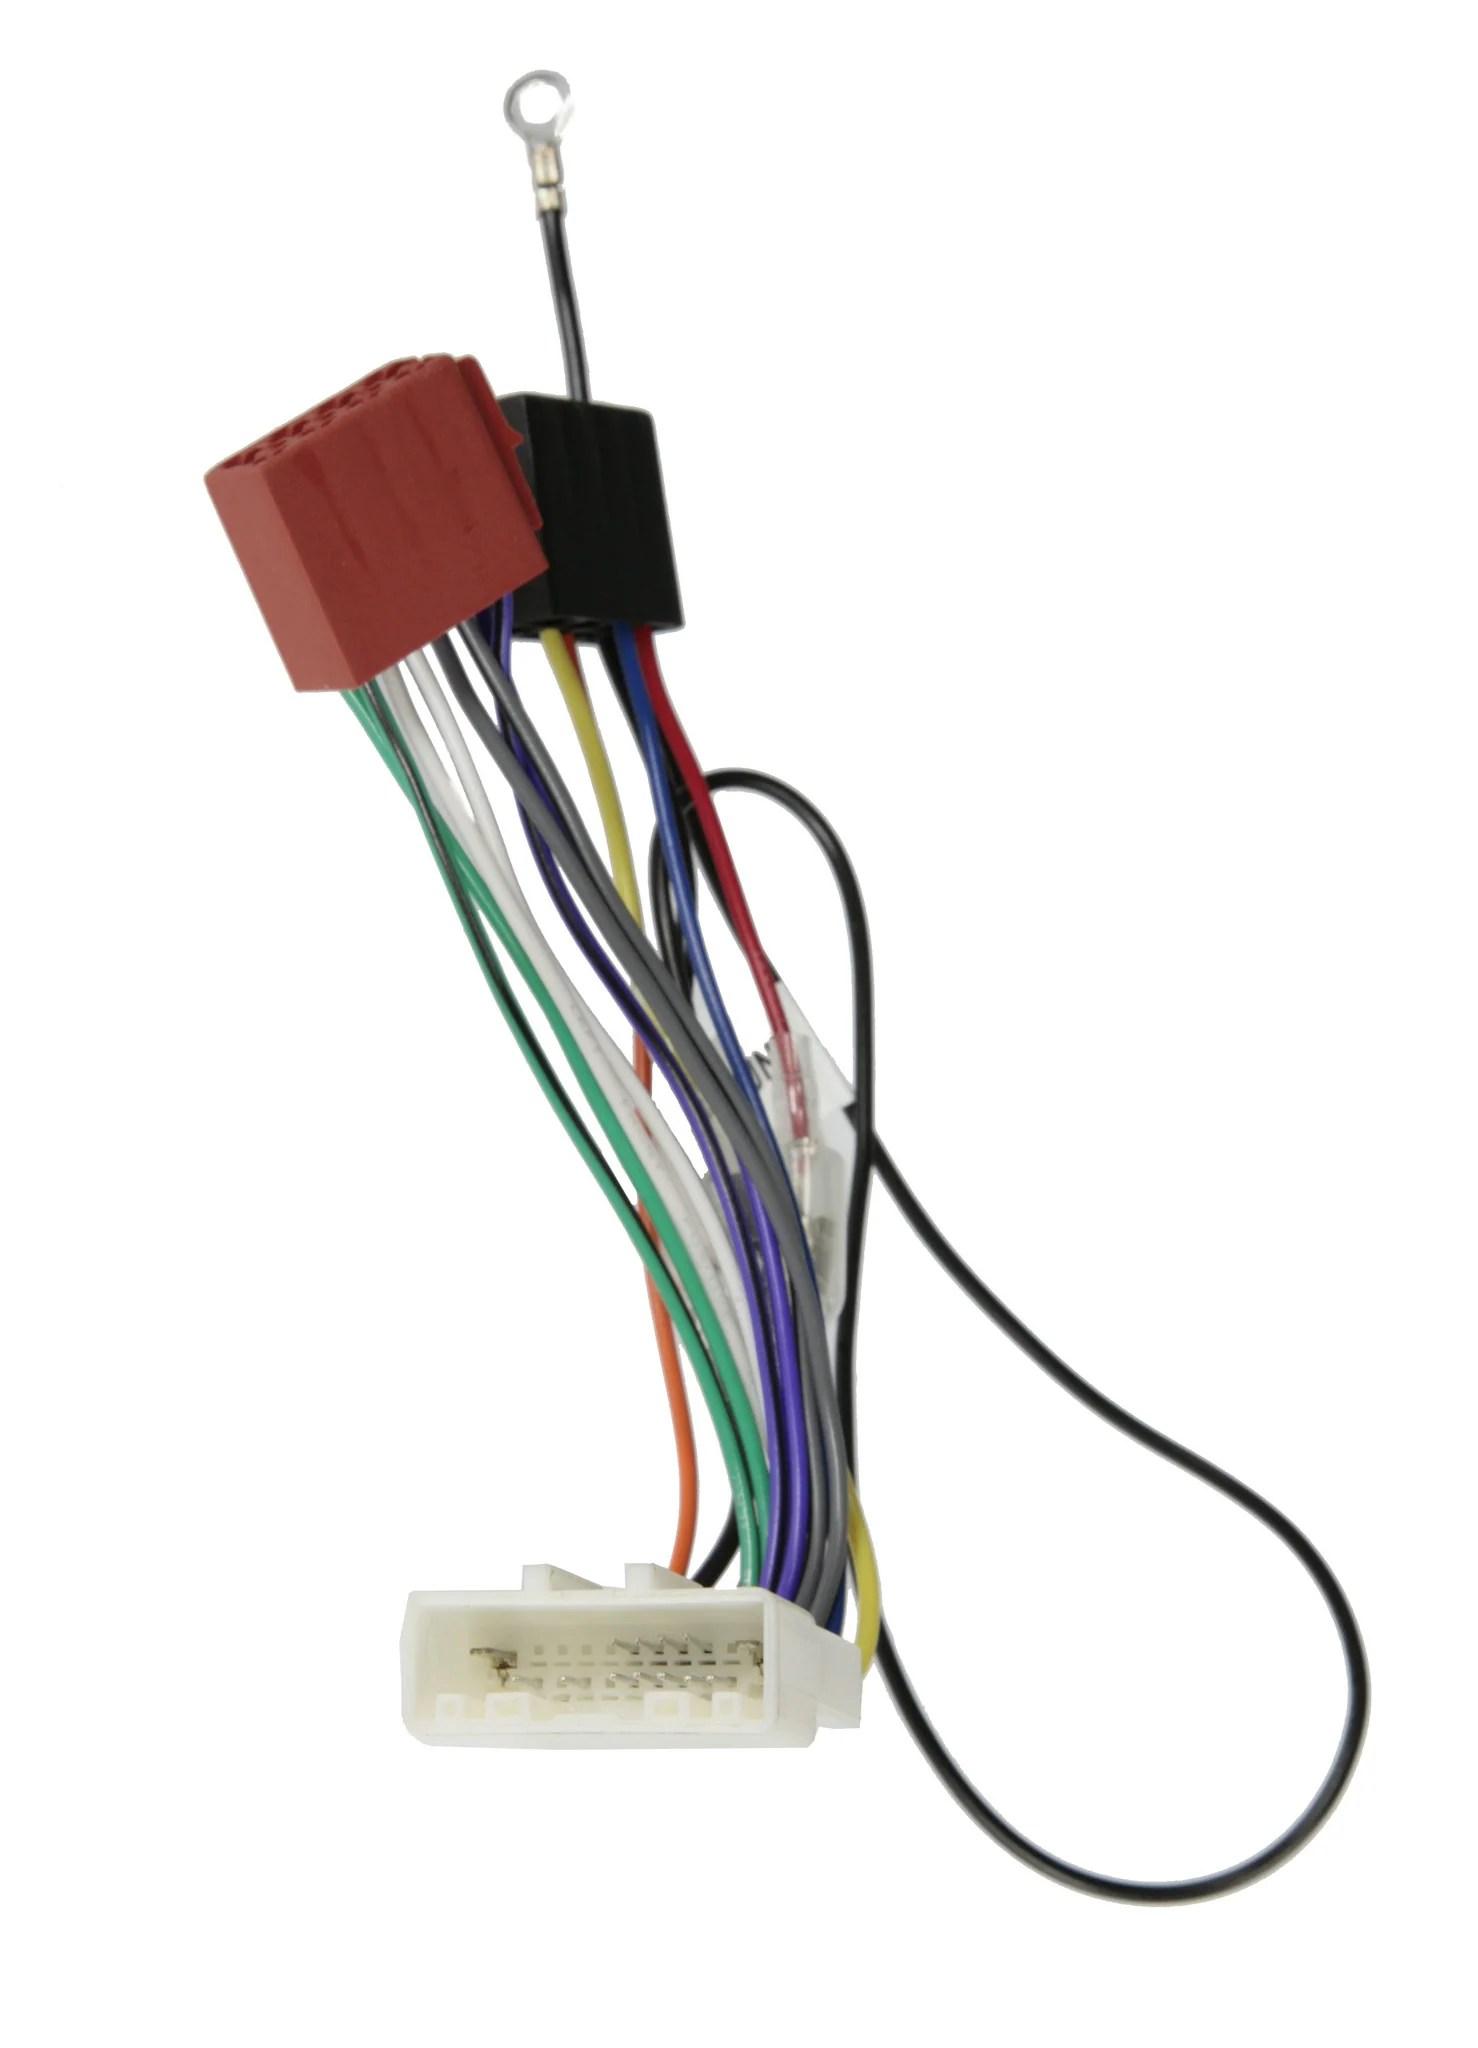 medium resolution of wiring harness adapter for subaru nissan to iso plug app091